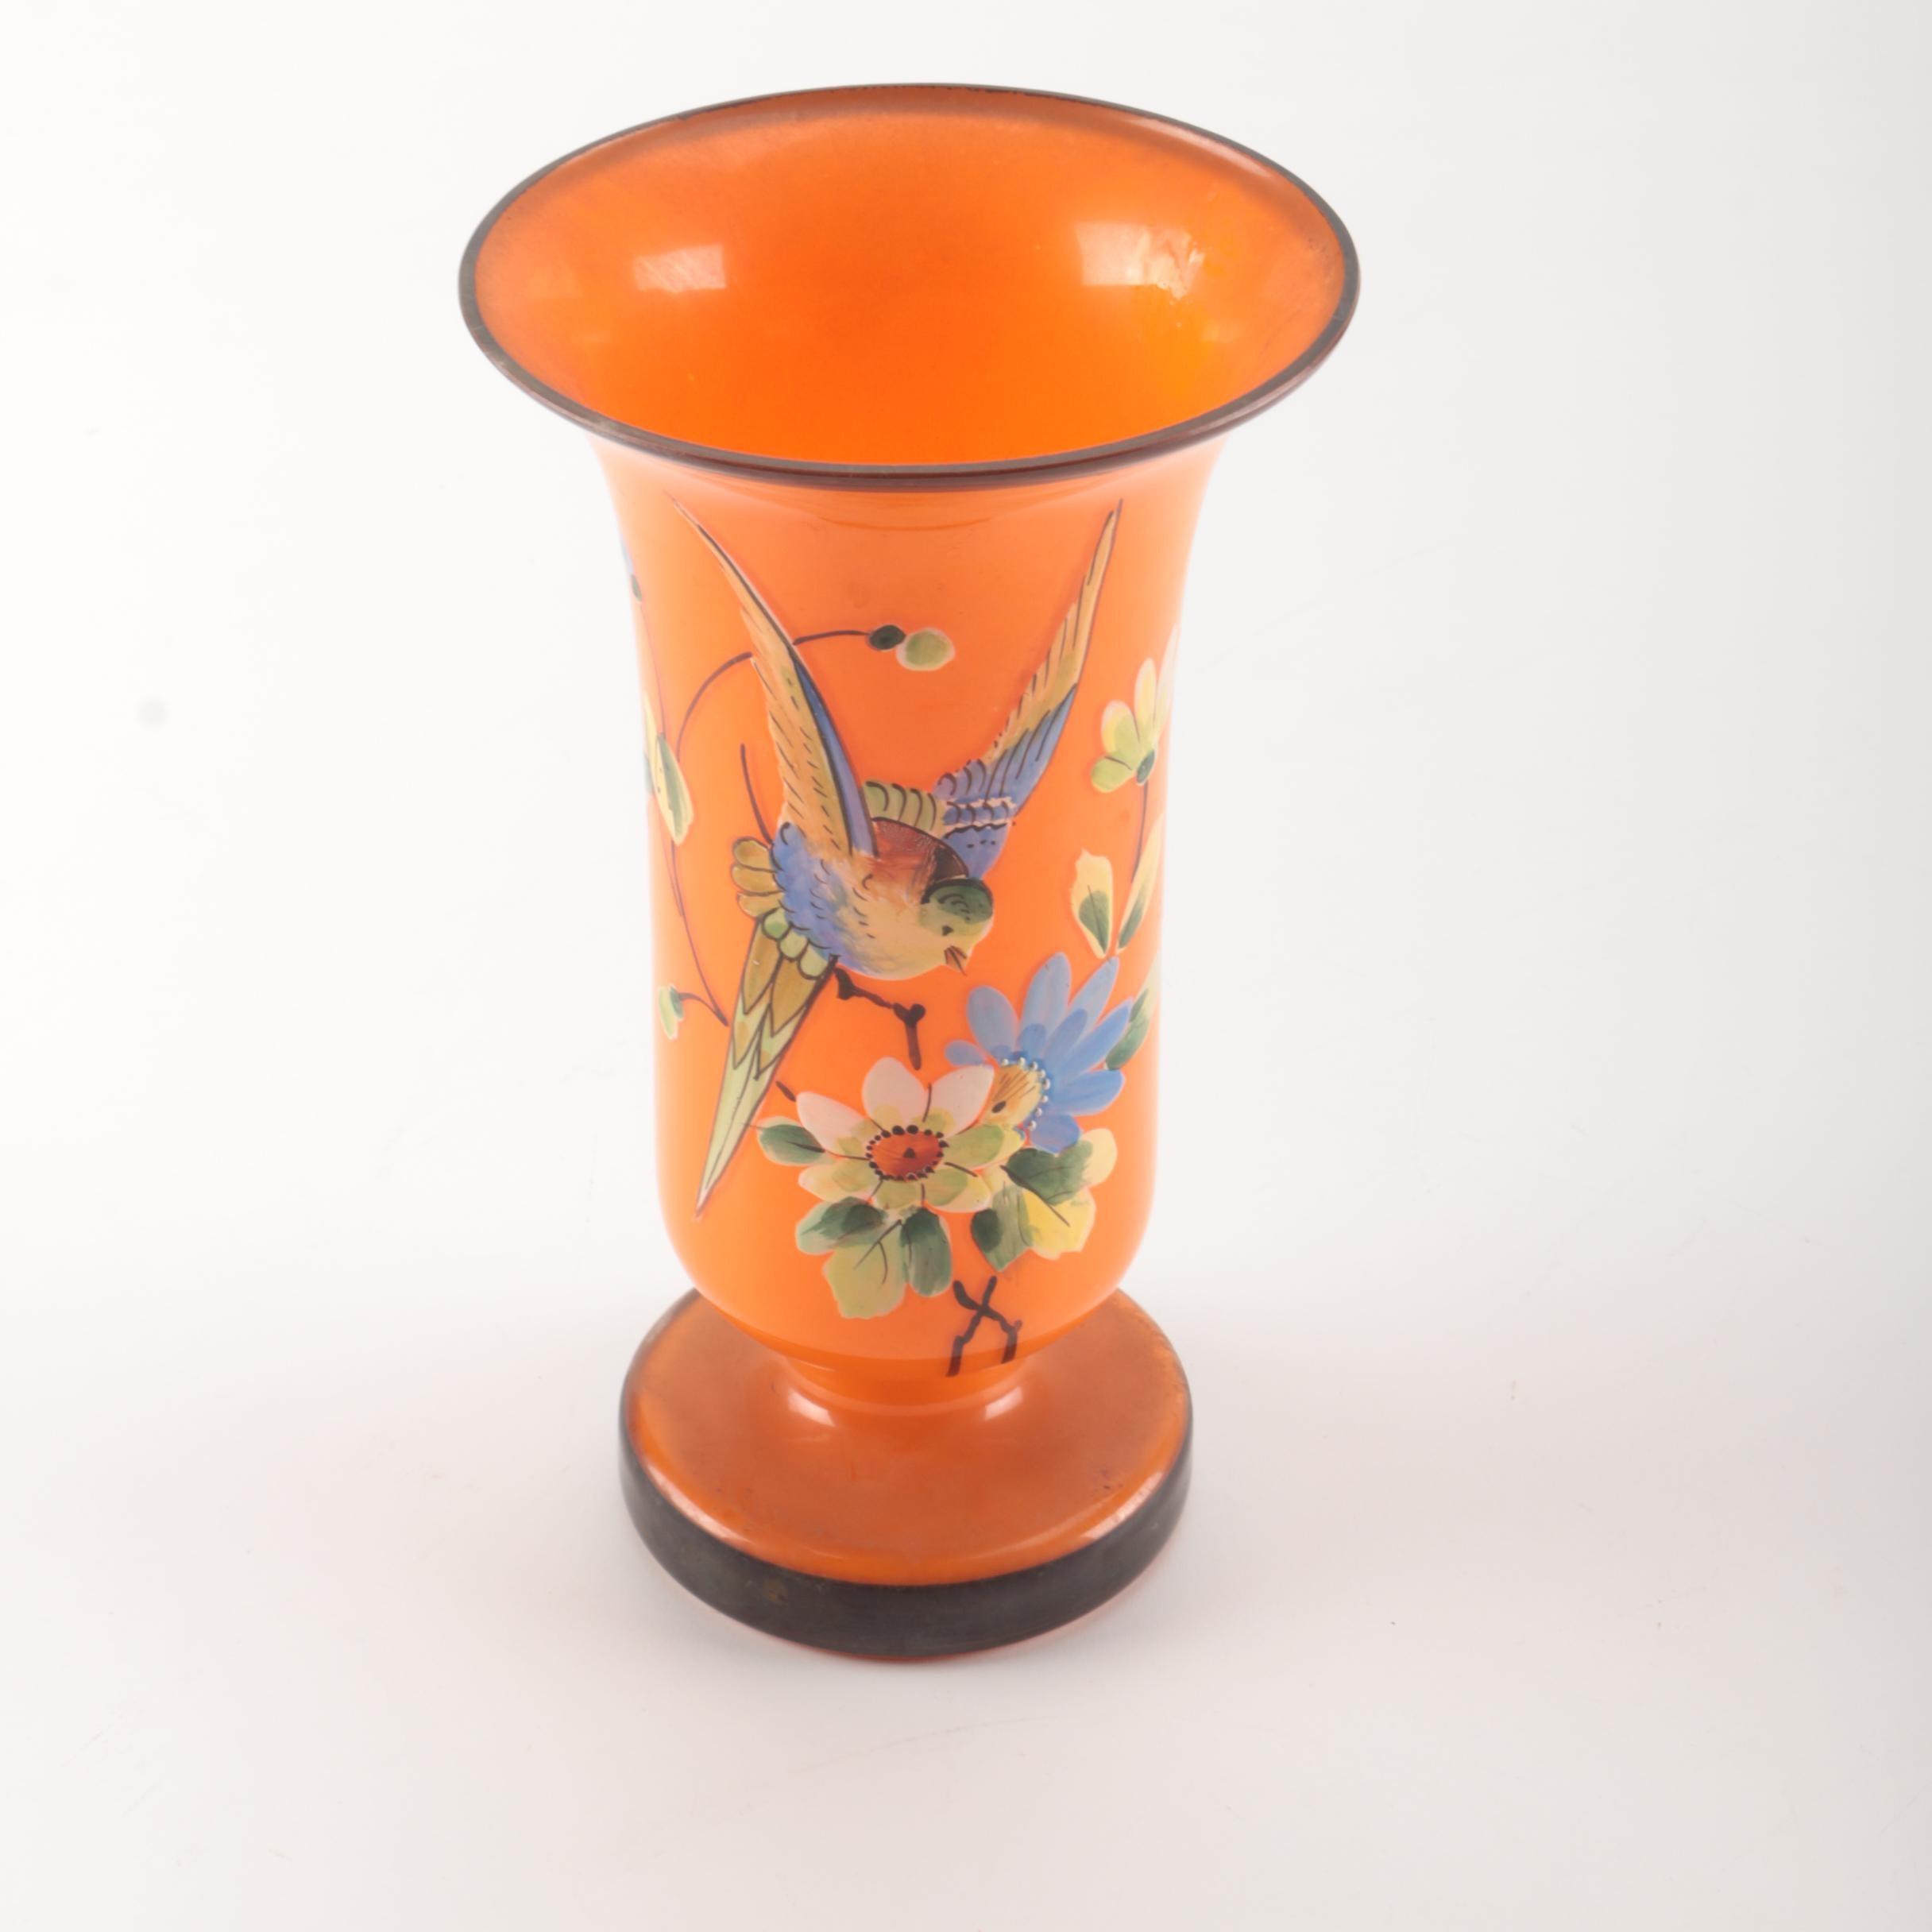 Orange Glass Vase With Bird and Flower Motif